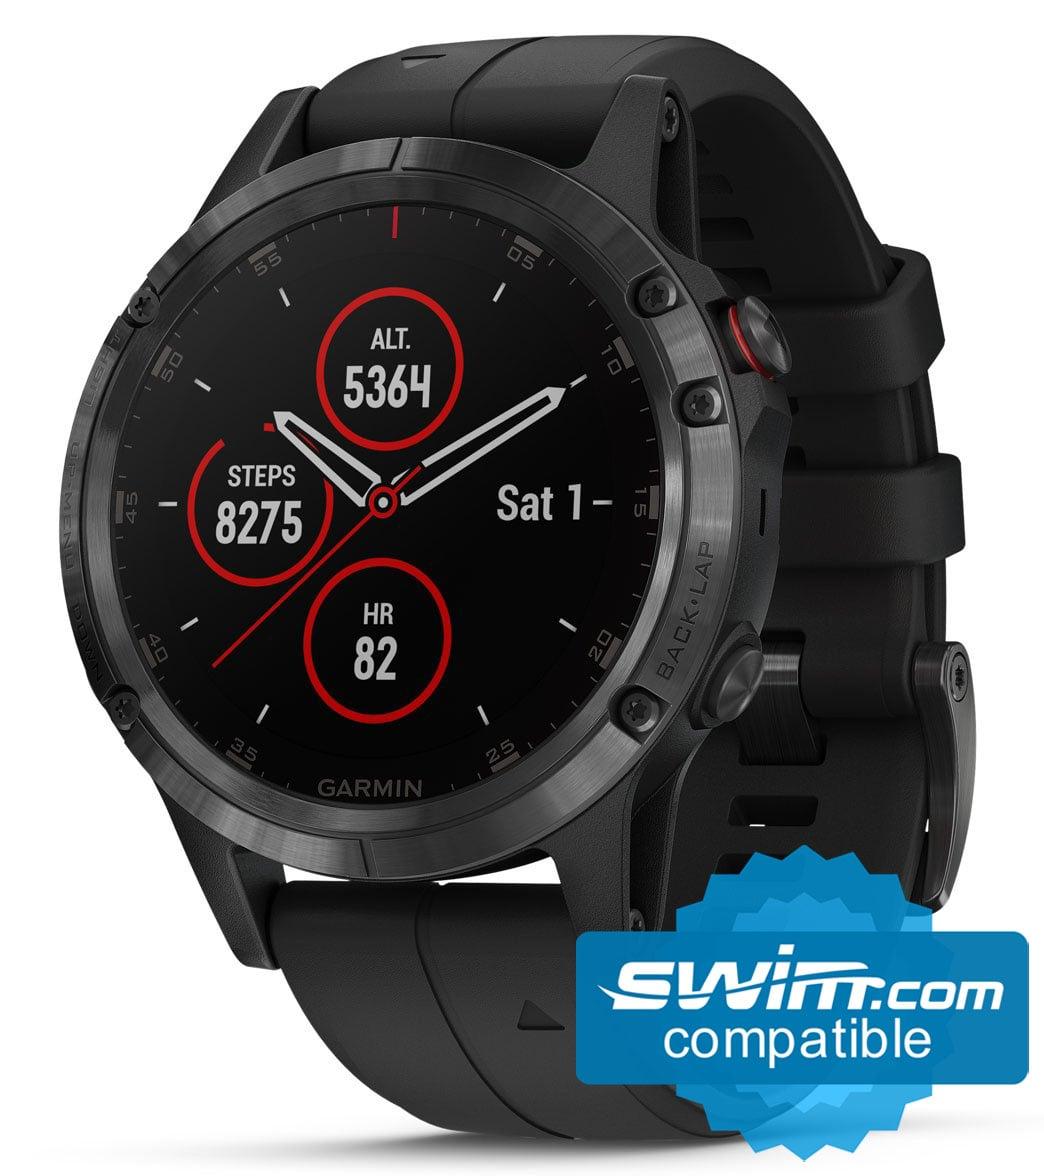 Garmin Sports Watch >> Garmin Fenix 5x Plus Sapphire Mutli Sport Gps Watch At Swimoutlet